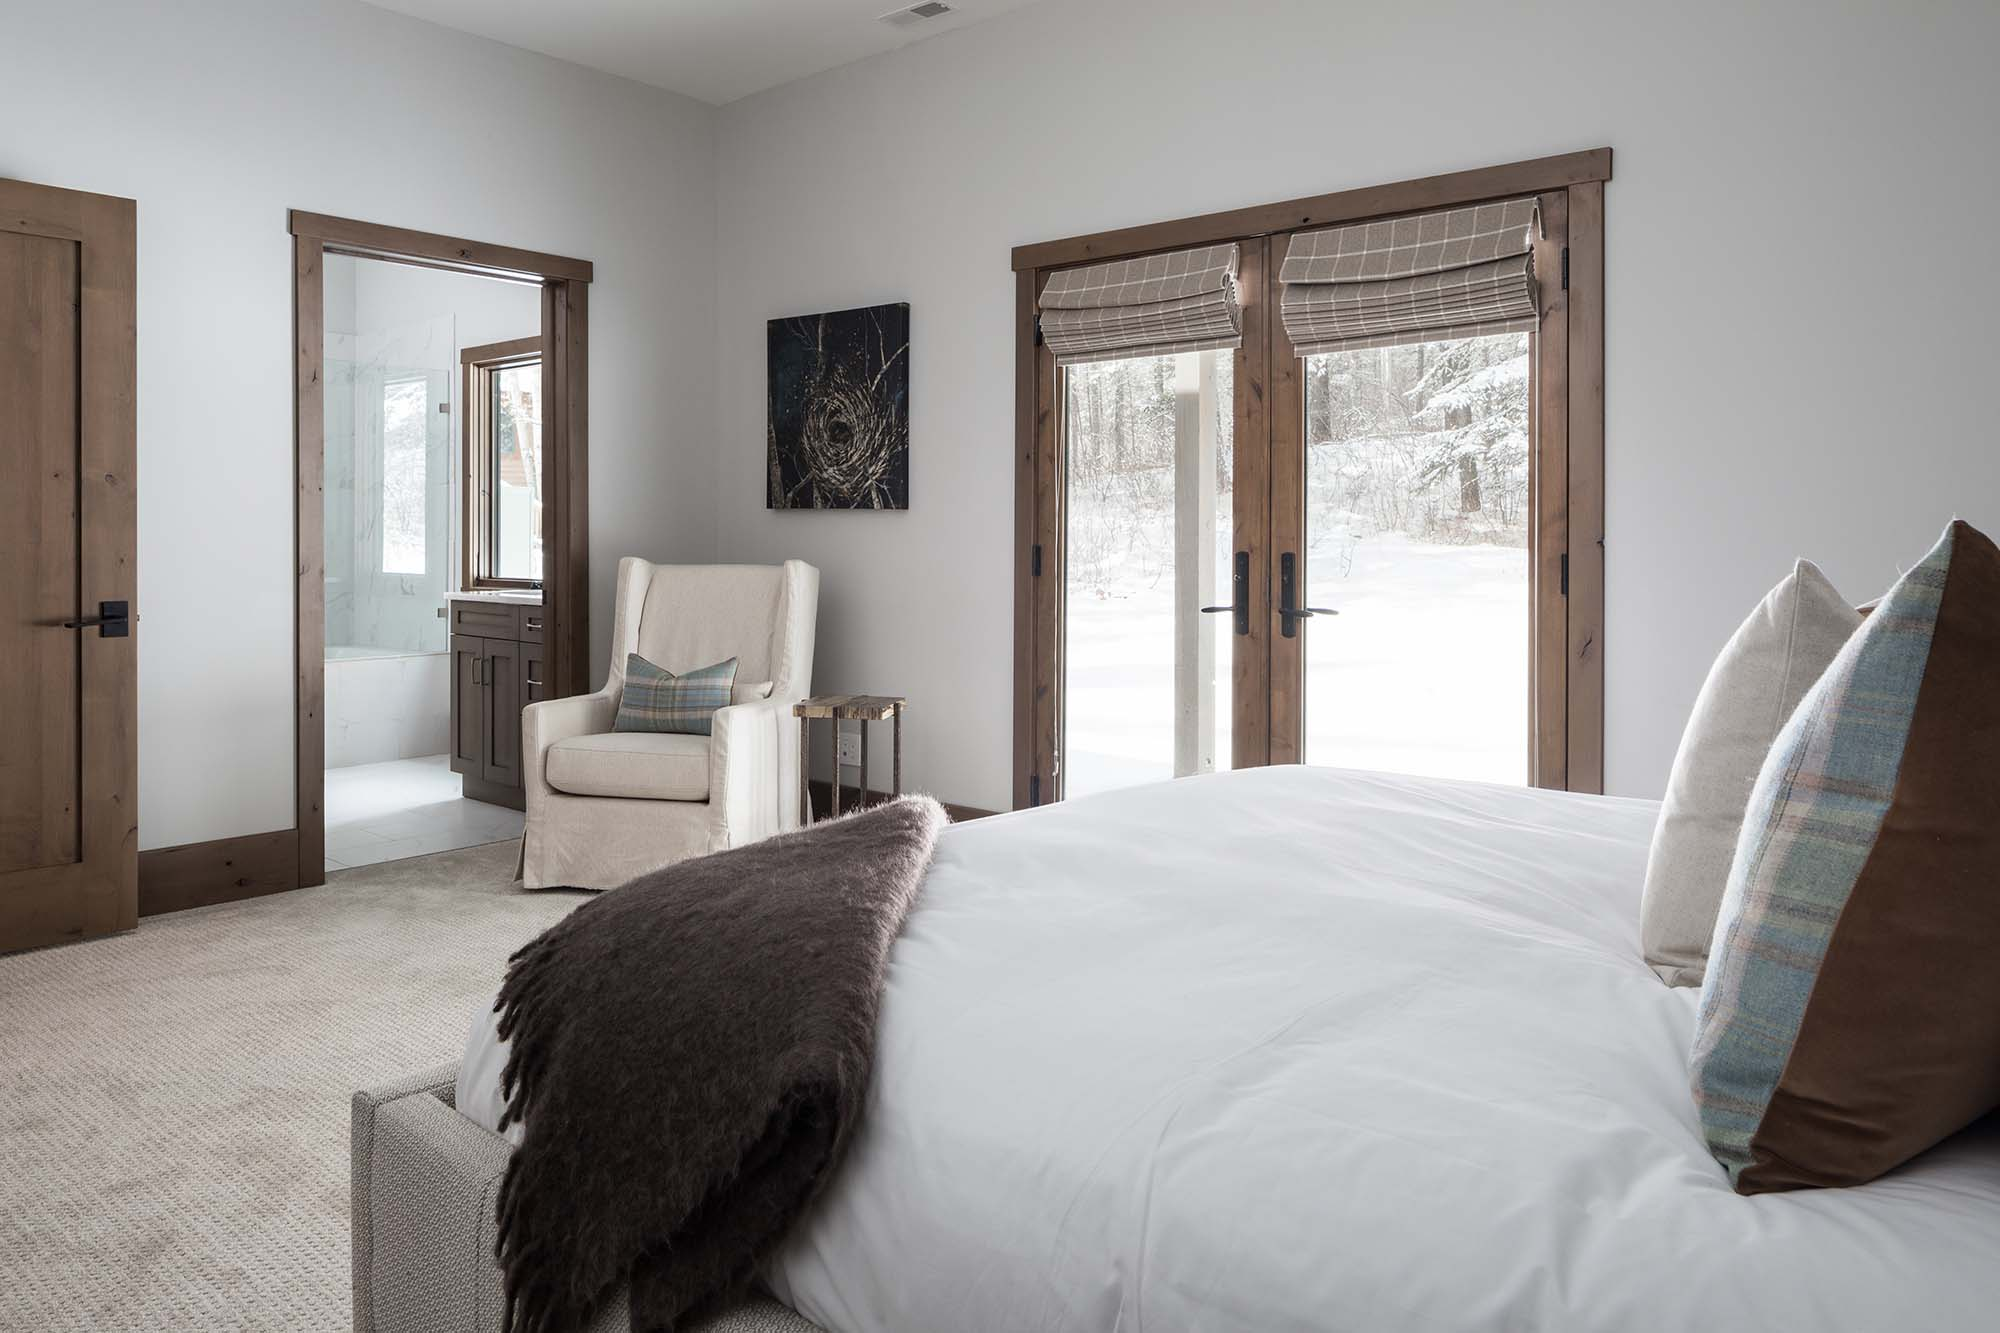 Stags Leap - Teton Village, WY Ski In Ski Out Real Estate